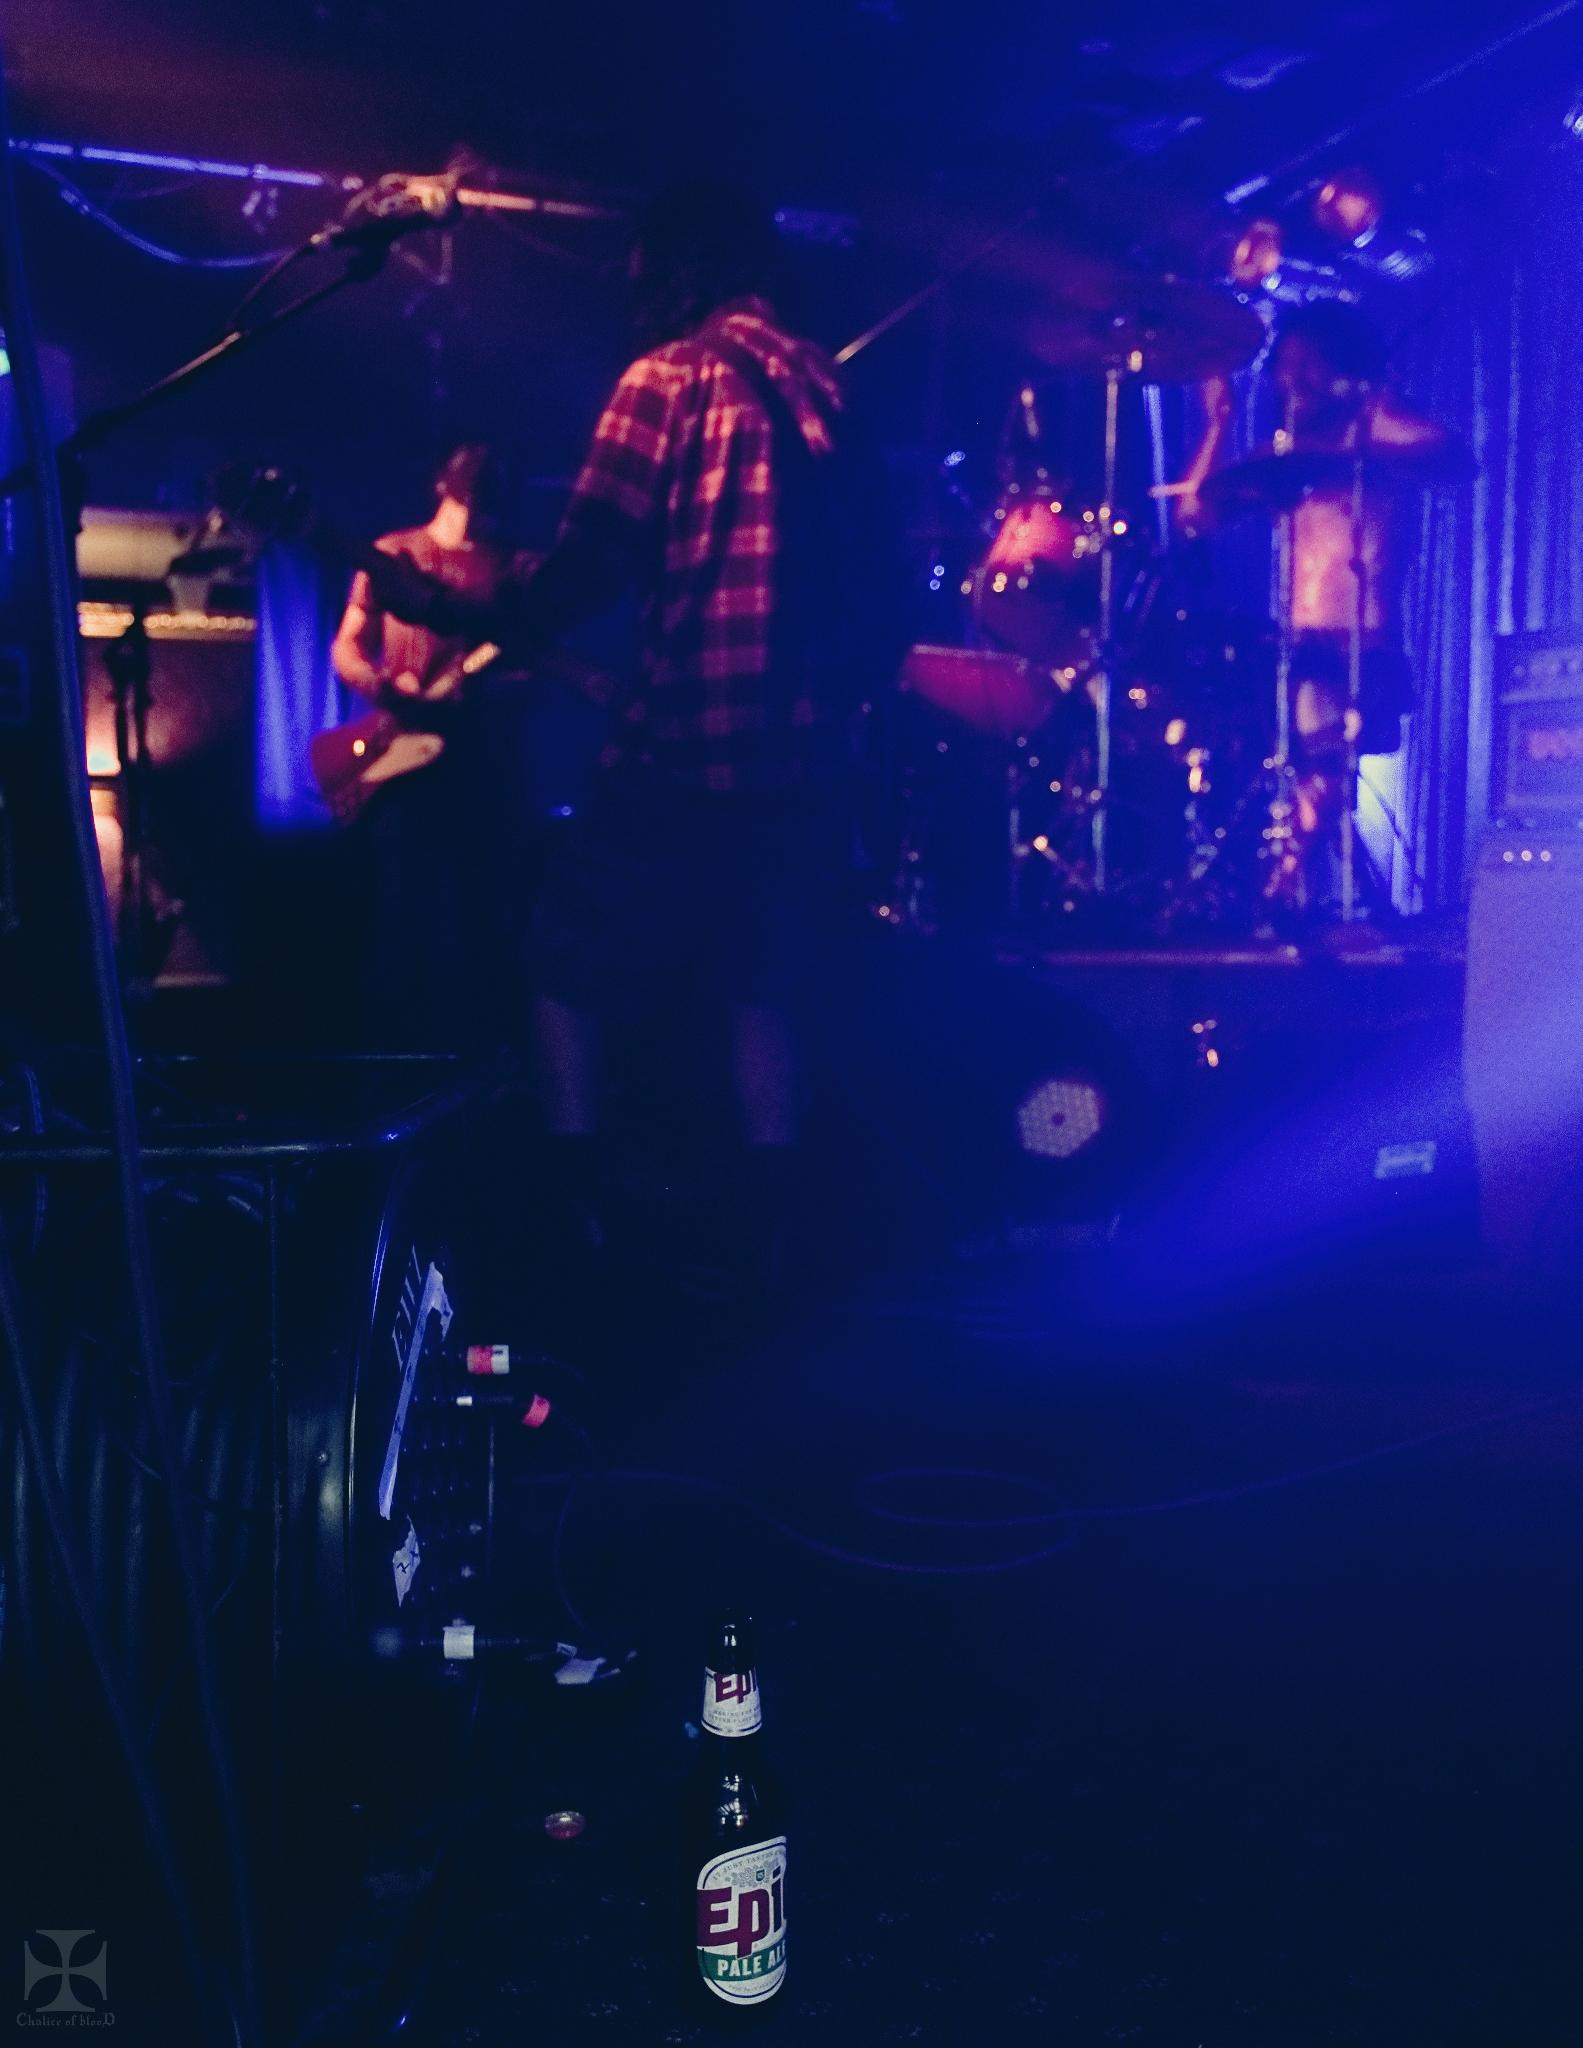 2018.01 A Doubtful Sound - 0062-Exposure.jpg